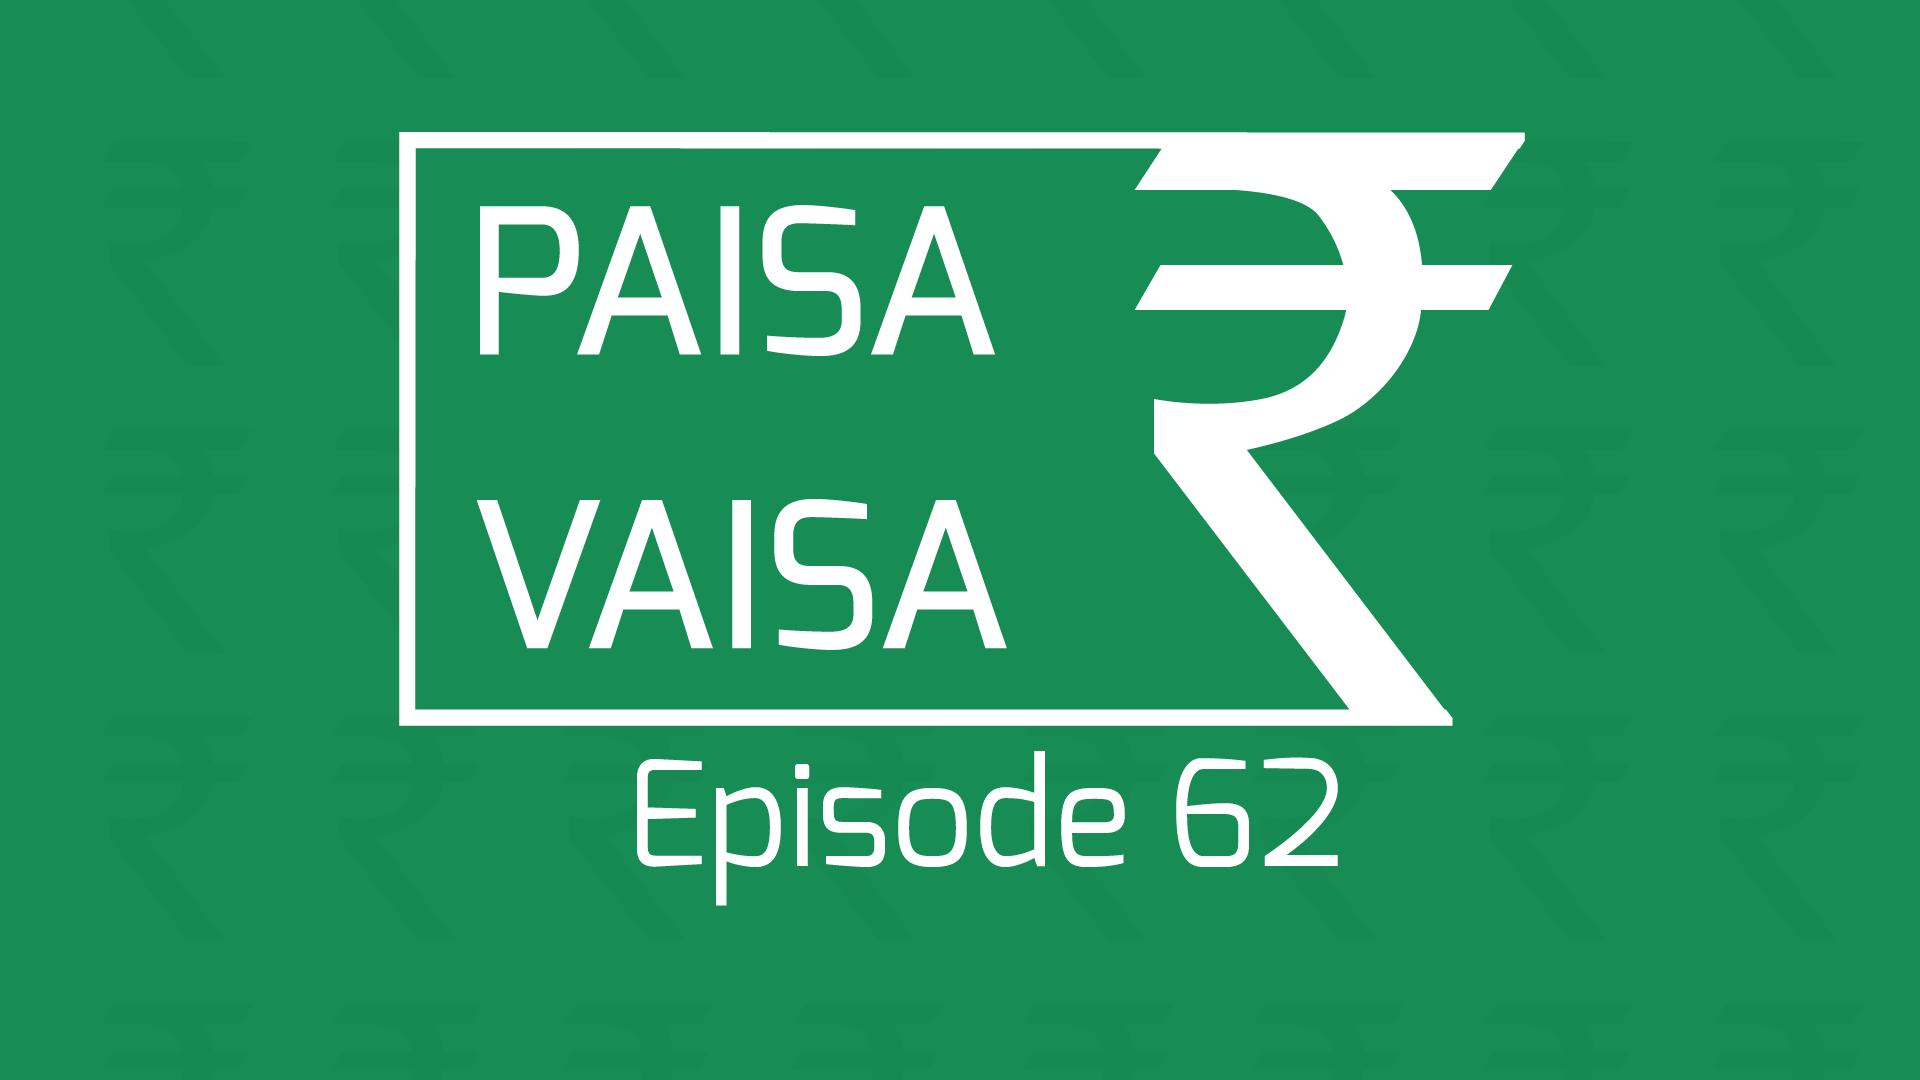 PaisaVaisaEpisode62.png